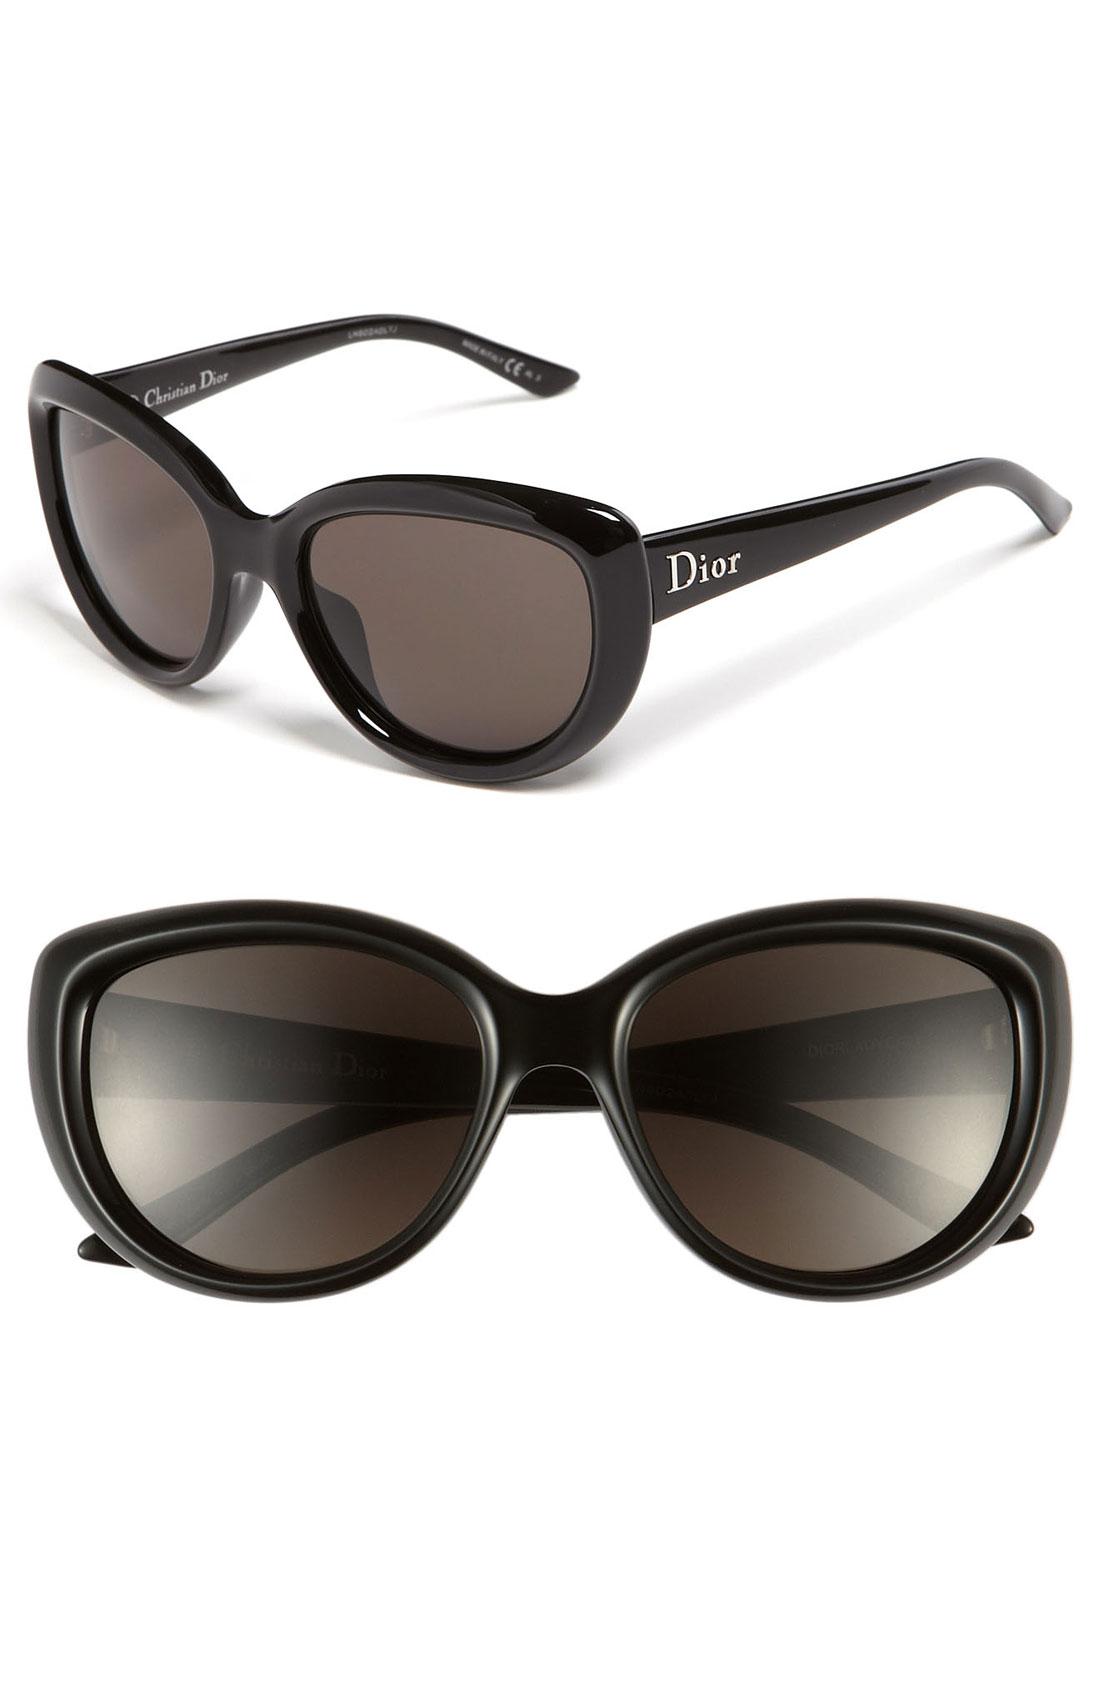 5029e6a655f6 Lady Dior Sunglasses Gls Blue Black